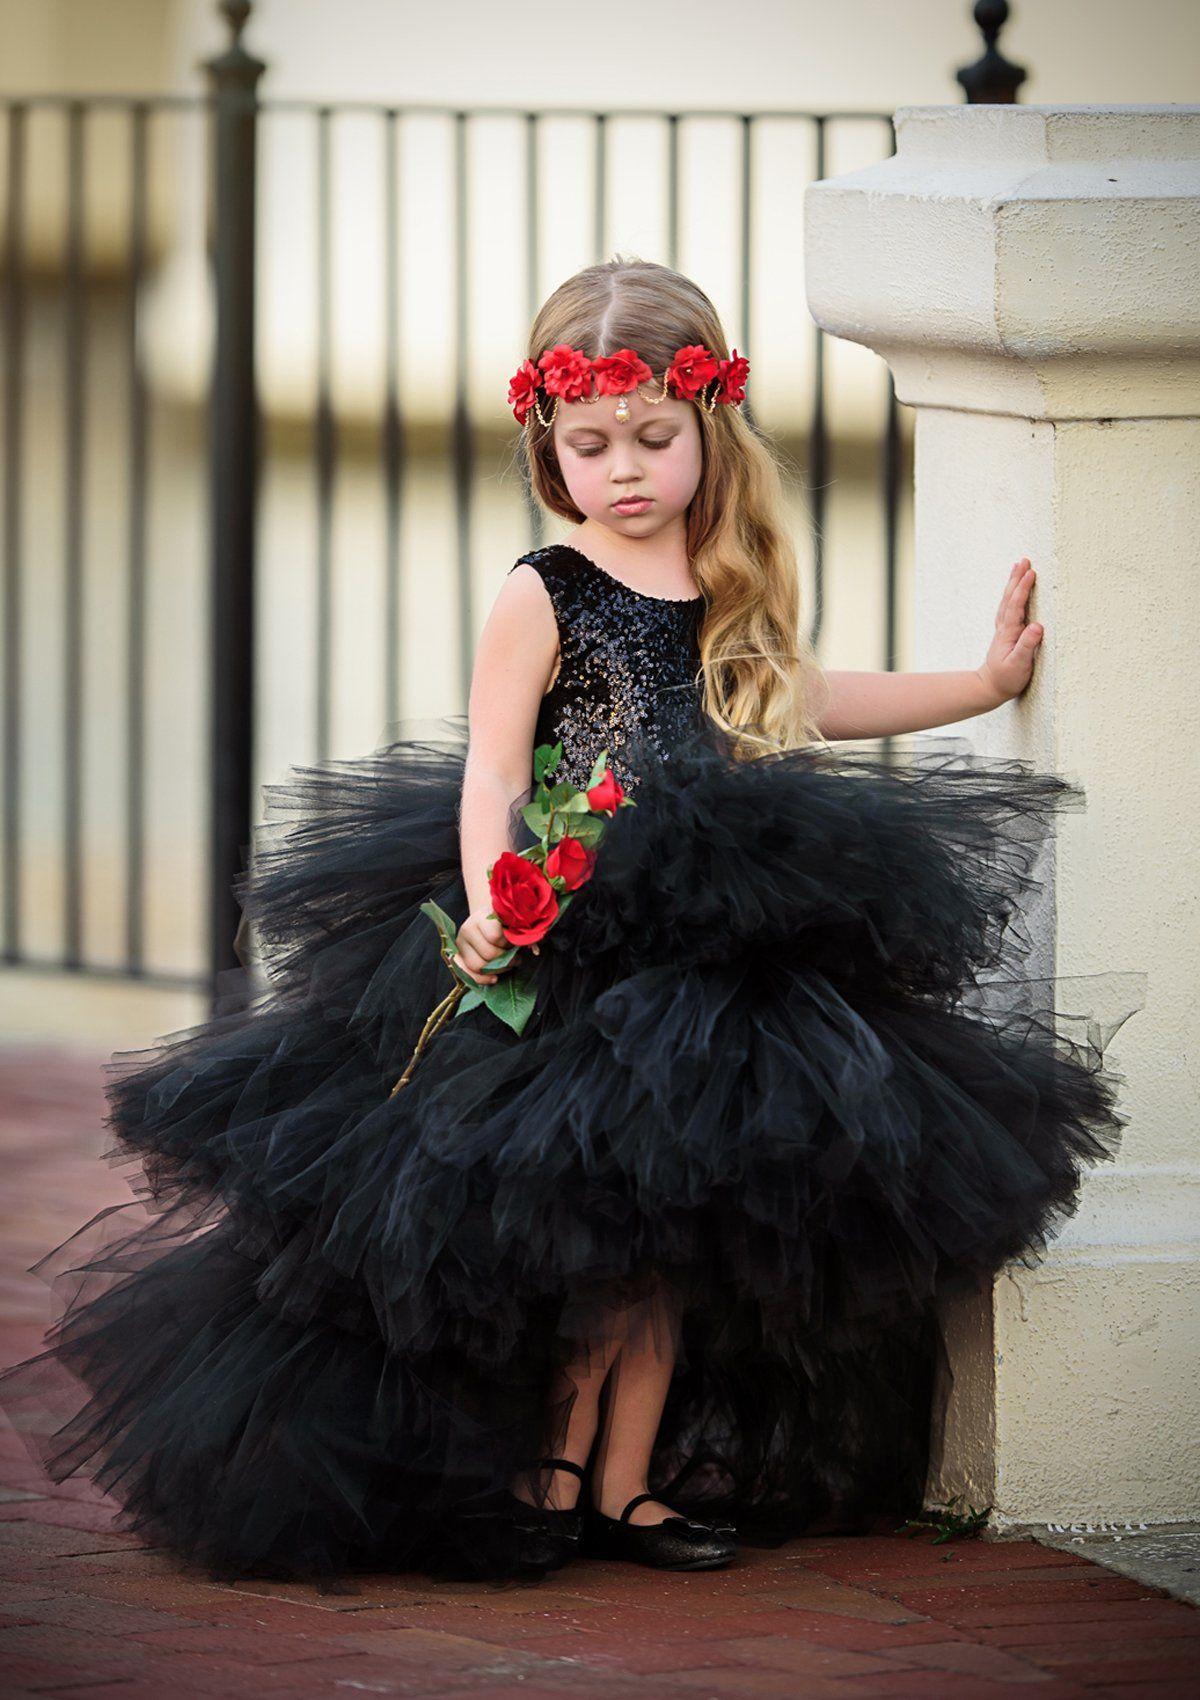 Black Flower Girl Tutu Dress-Black Tutu Dress-Black Dress-Black Girl Tutu-Black Wedding Dress-Black Bride Dress-Black Sequin Tutu Dress